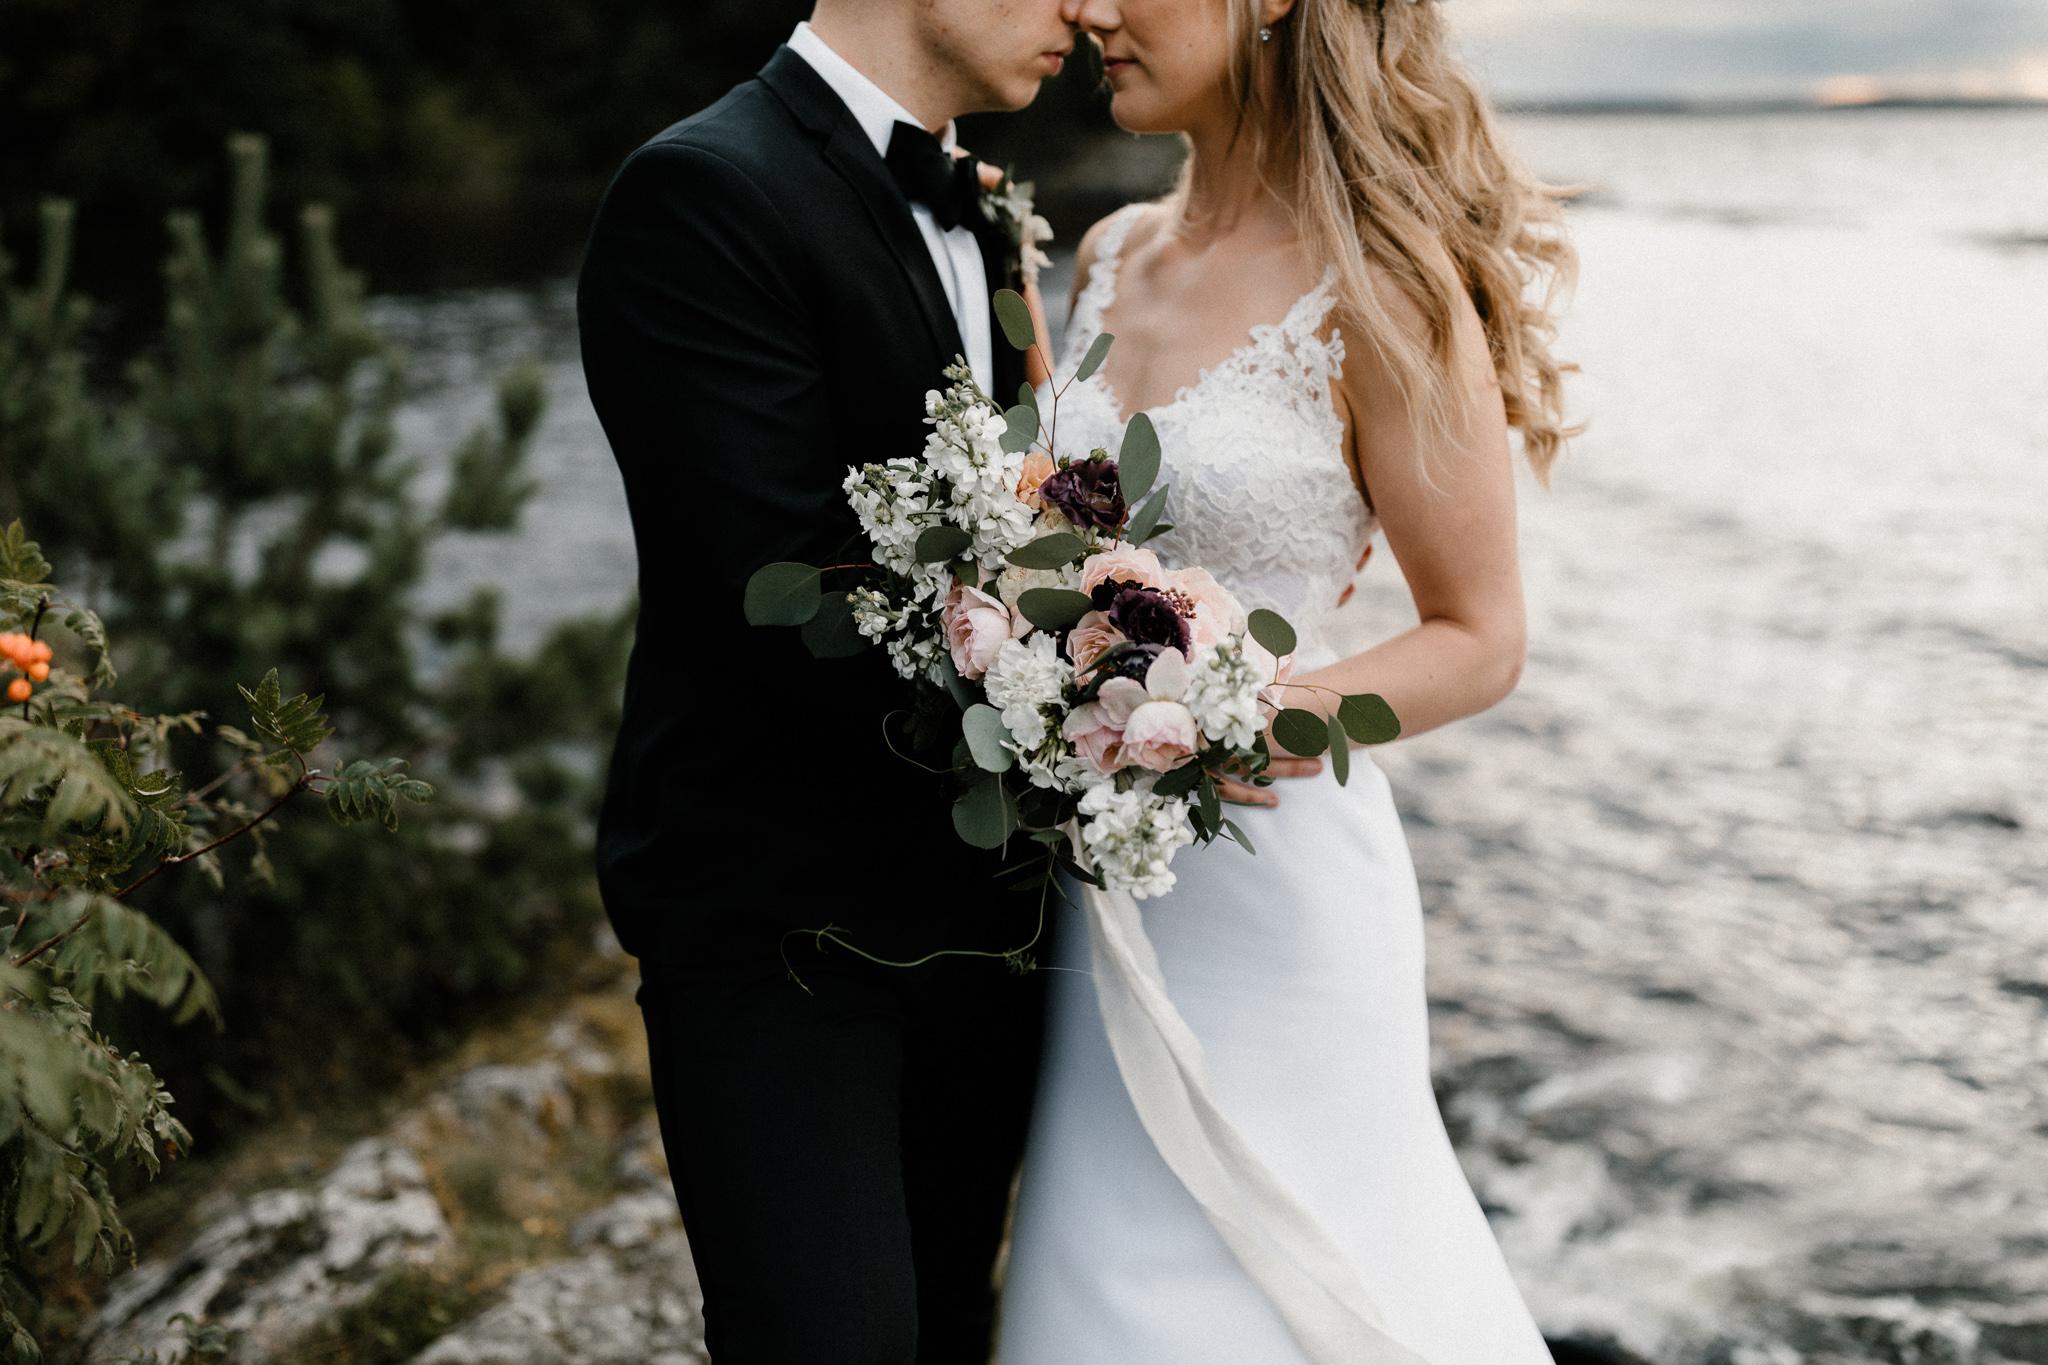 Johanna + Mikko - Tampere - Photo by Patrick Karkkolainen Wedding Photographer-125.jpg